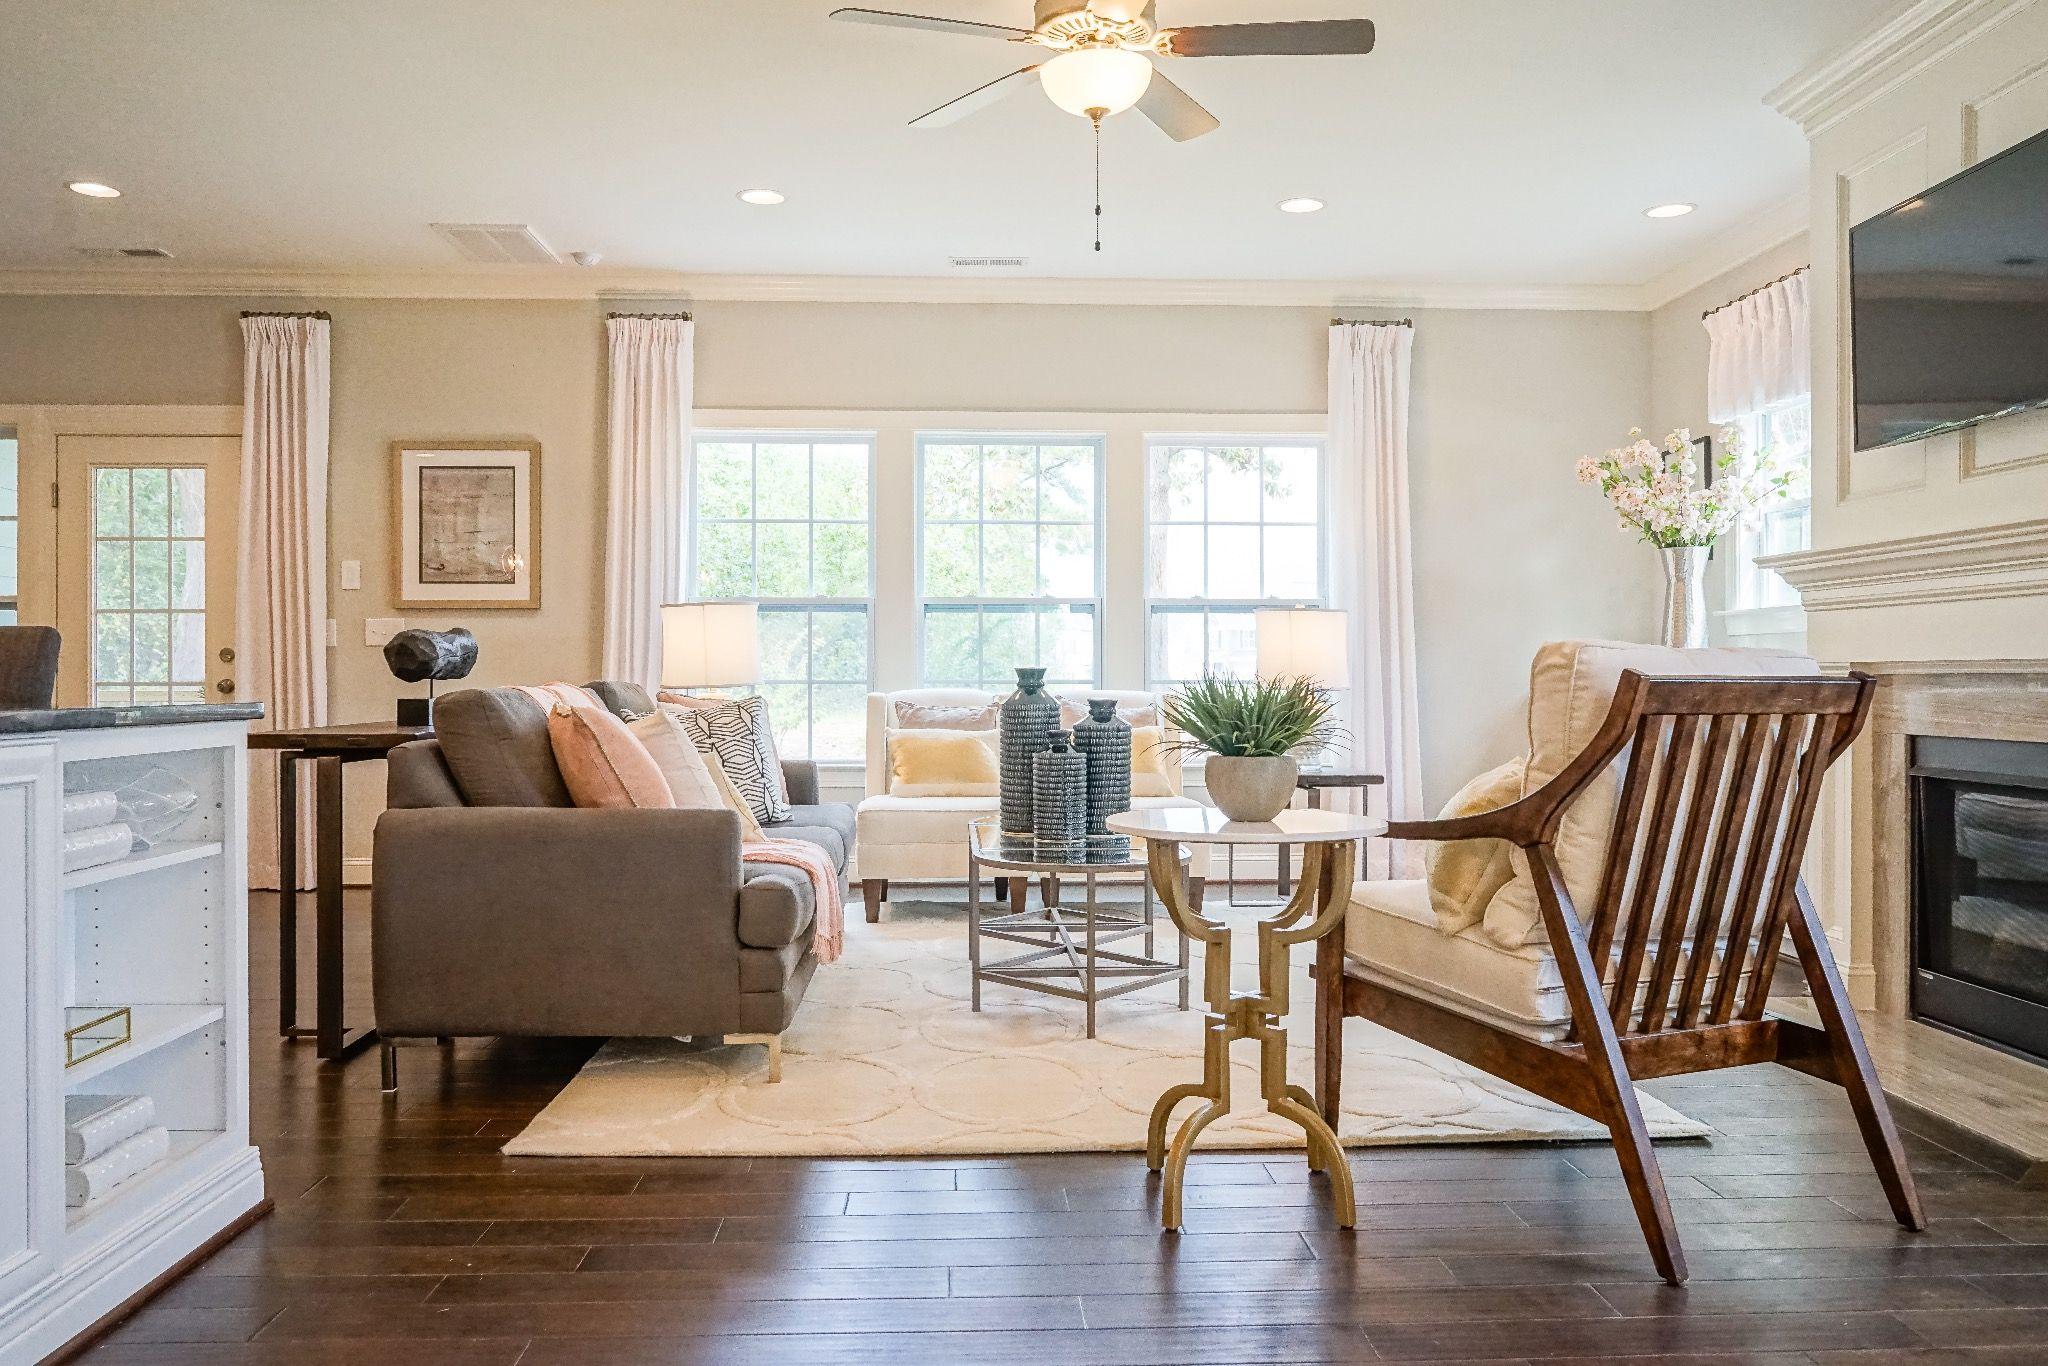 royal oaks fuquay varina nc communities u0026 homes for sale